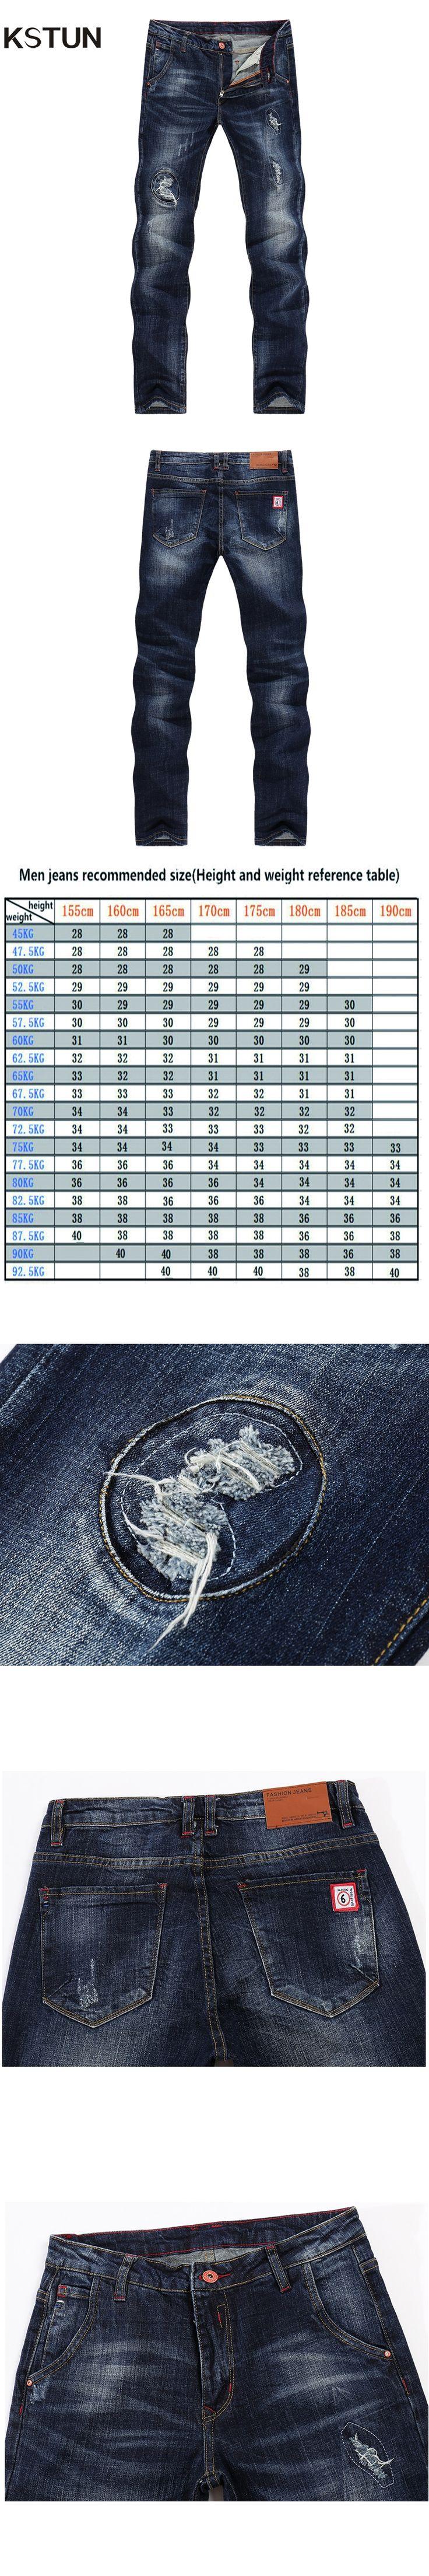 KSTUN Quality Brand Jeans Men Straight Slim Blue Ripped Patchwork Distressed Torn Biker Jeans Man Boys Students Denim Pants 38